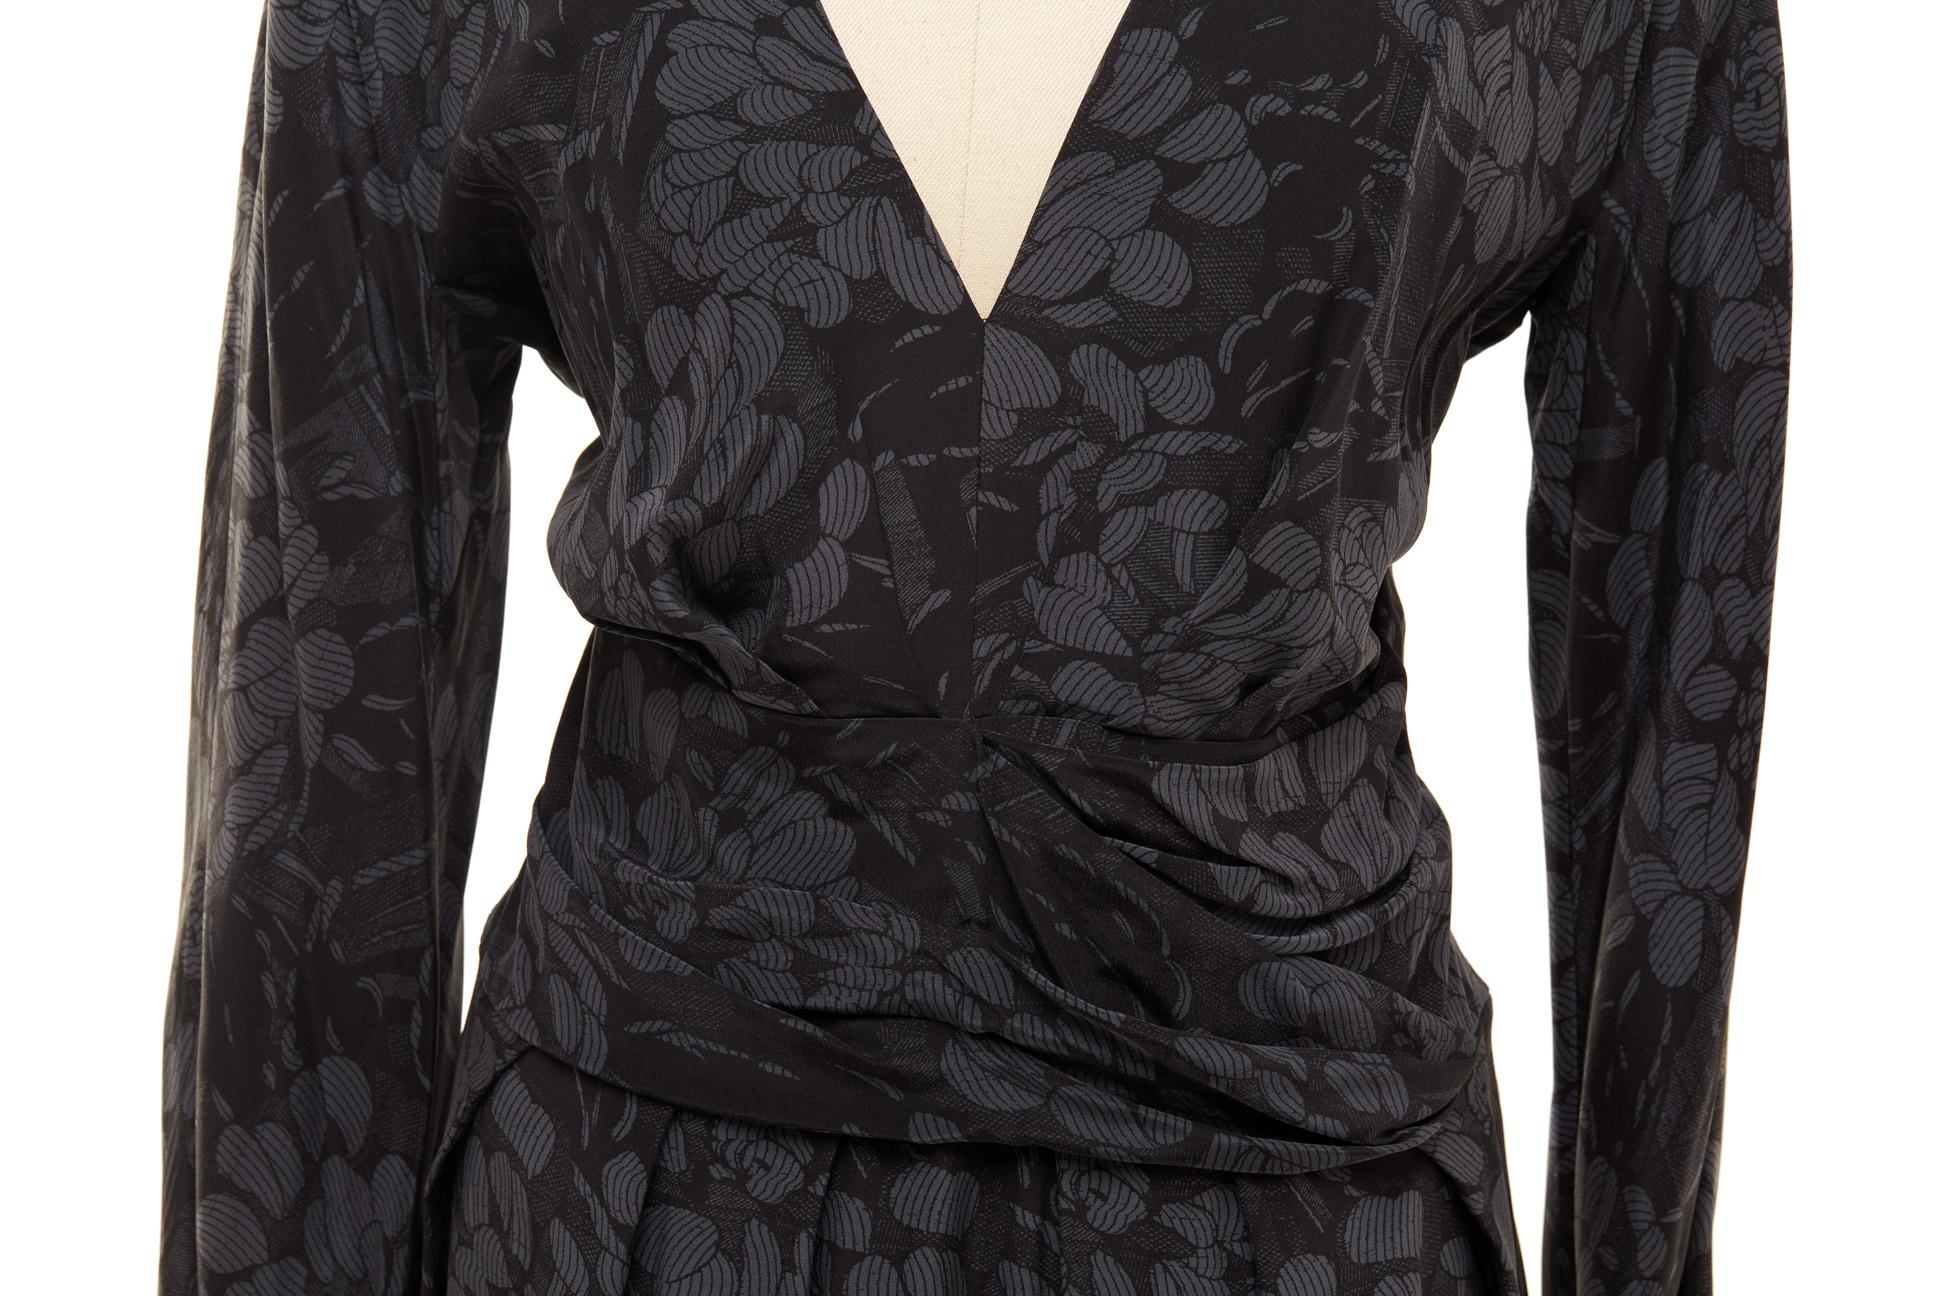 A BOTTEGA VENETA BLACK FLORAL SILK DRESS - Image 2 of 2